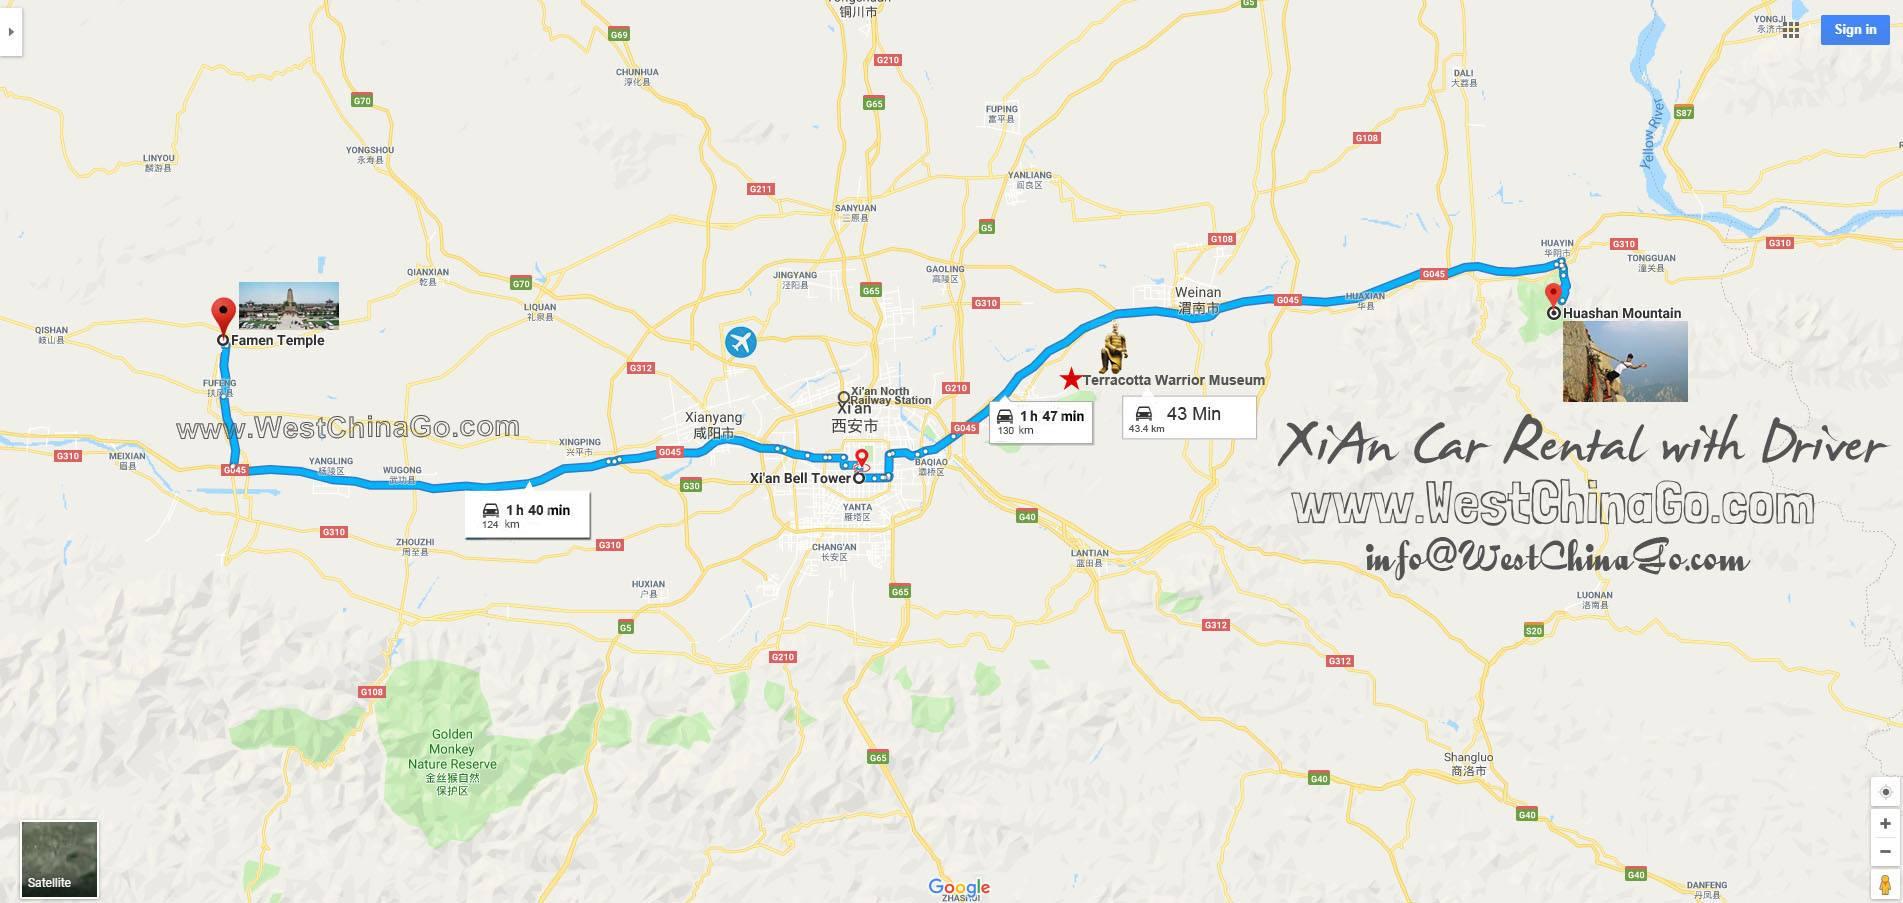 XiAn Terracotta Warriors car rental with driver